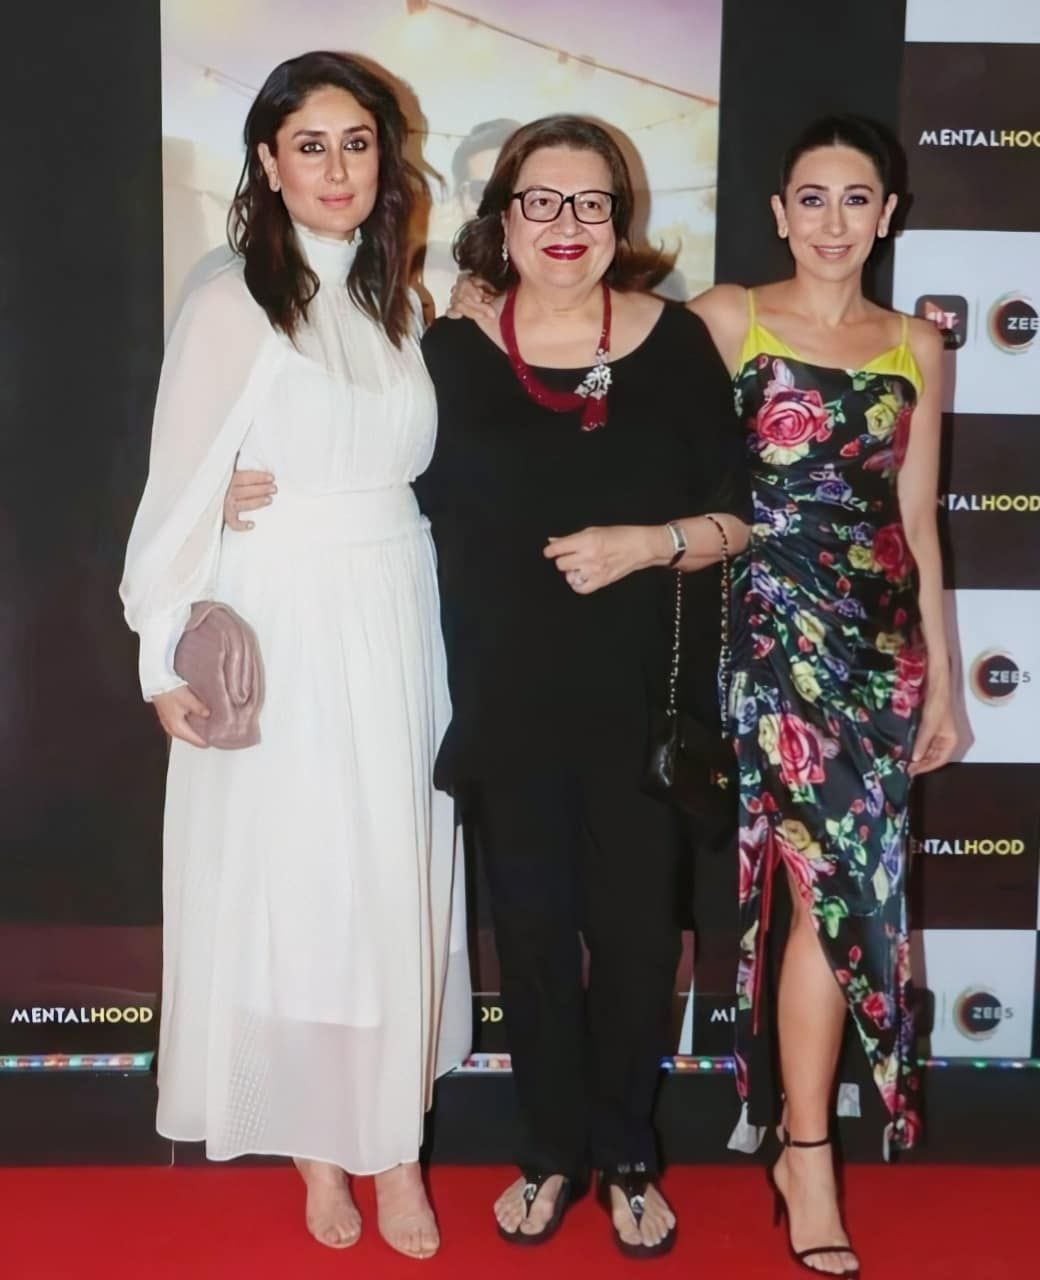 Kareena Kapoor And Her Mother Babita Kapoor Turn Up To Support Karishma Kapoor For Screening Of Mentalhood Hungryboo Kareena Kapoor Kareena Kapoor Khan Fashion Outfits